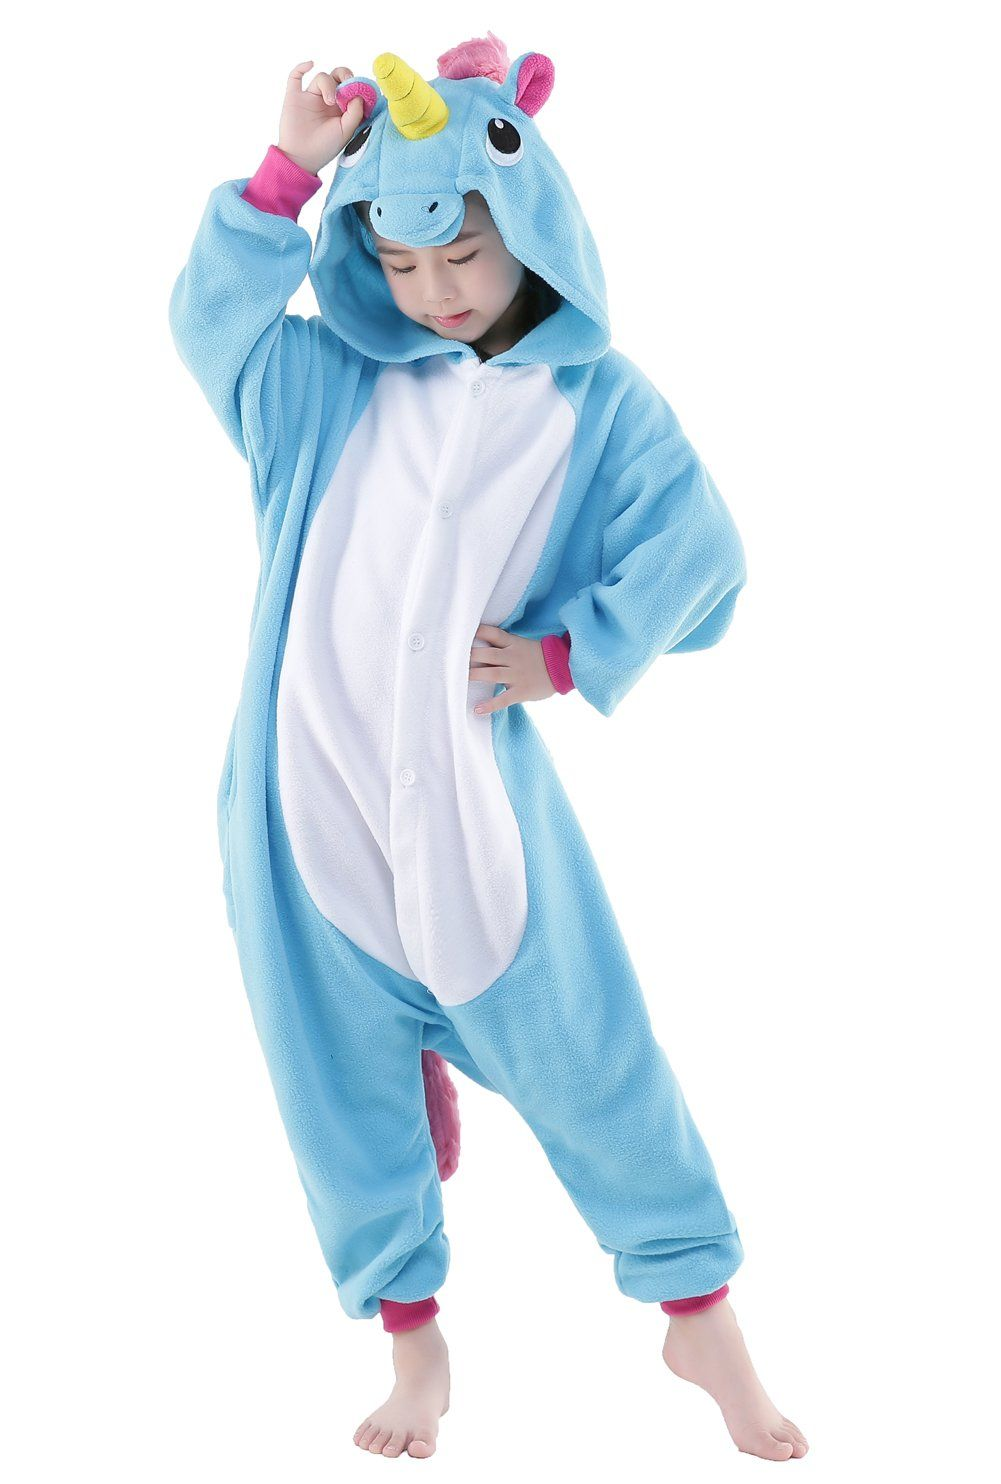 5cd8c1863ab4 NEWCOSPLAY Animal Cosplay Costume Unisex Kids Unicorn Pajamas 115 ...